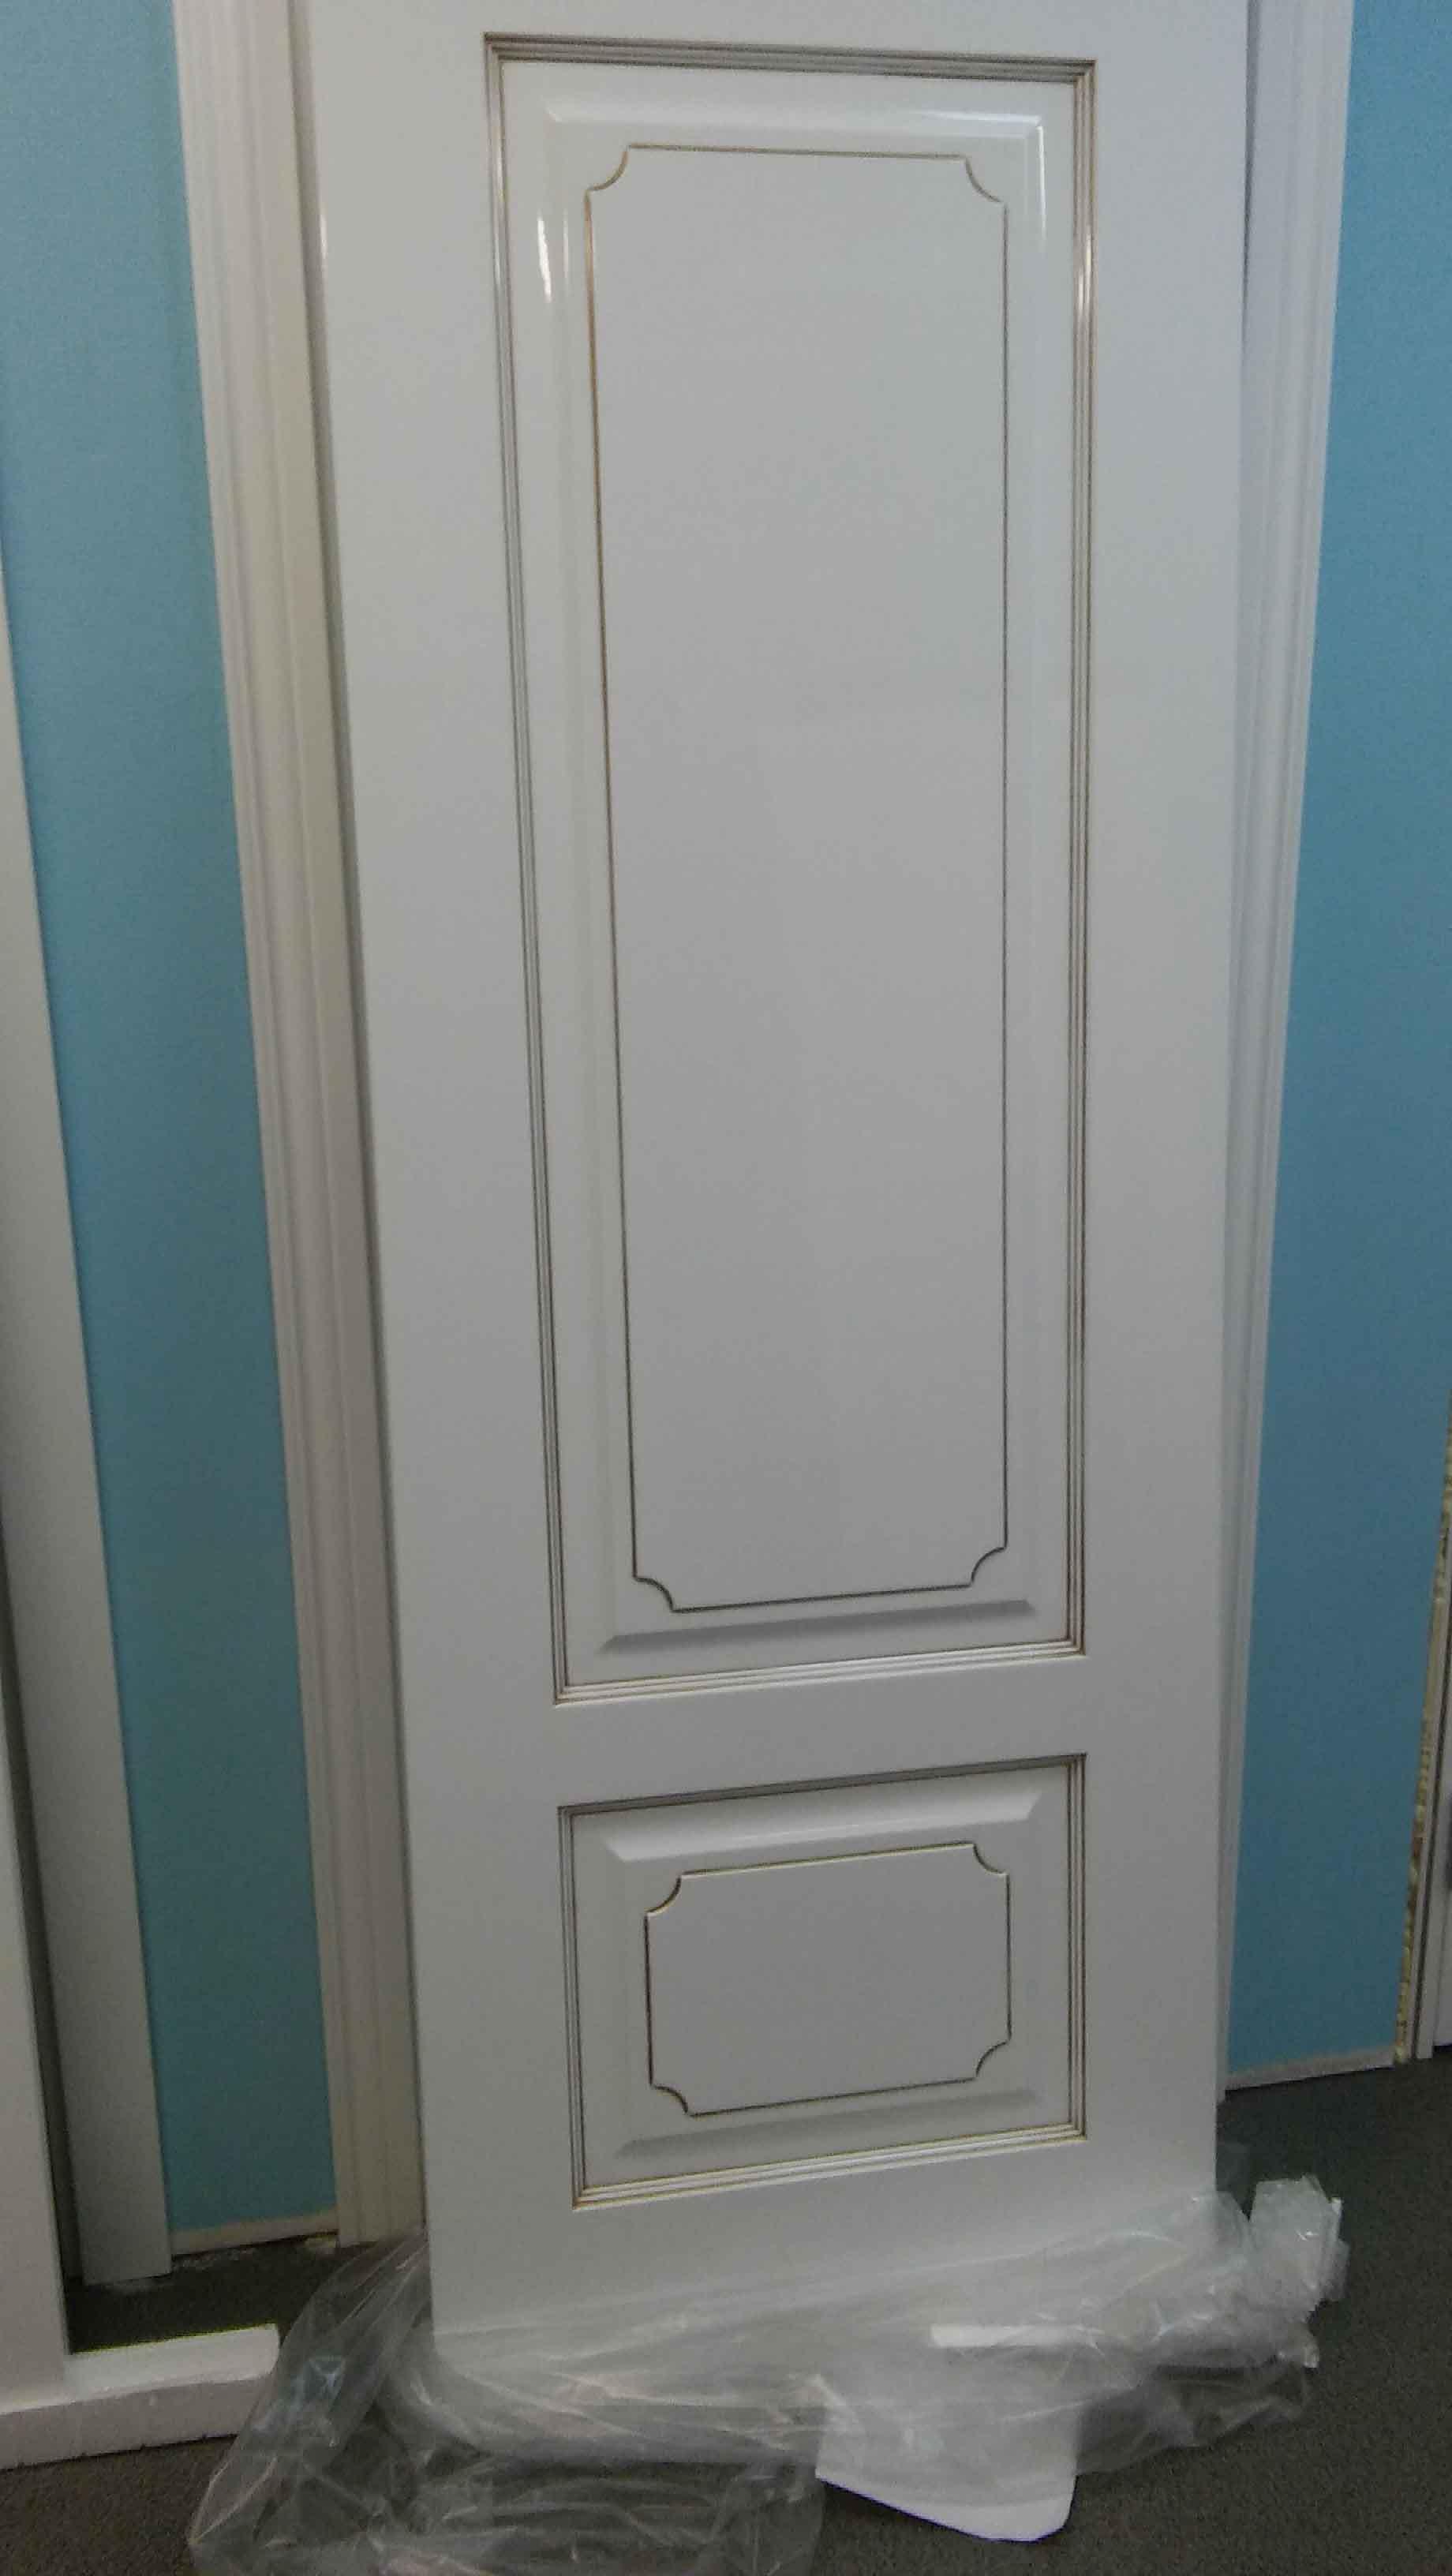 фото глянцевой двери